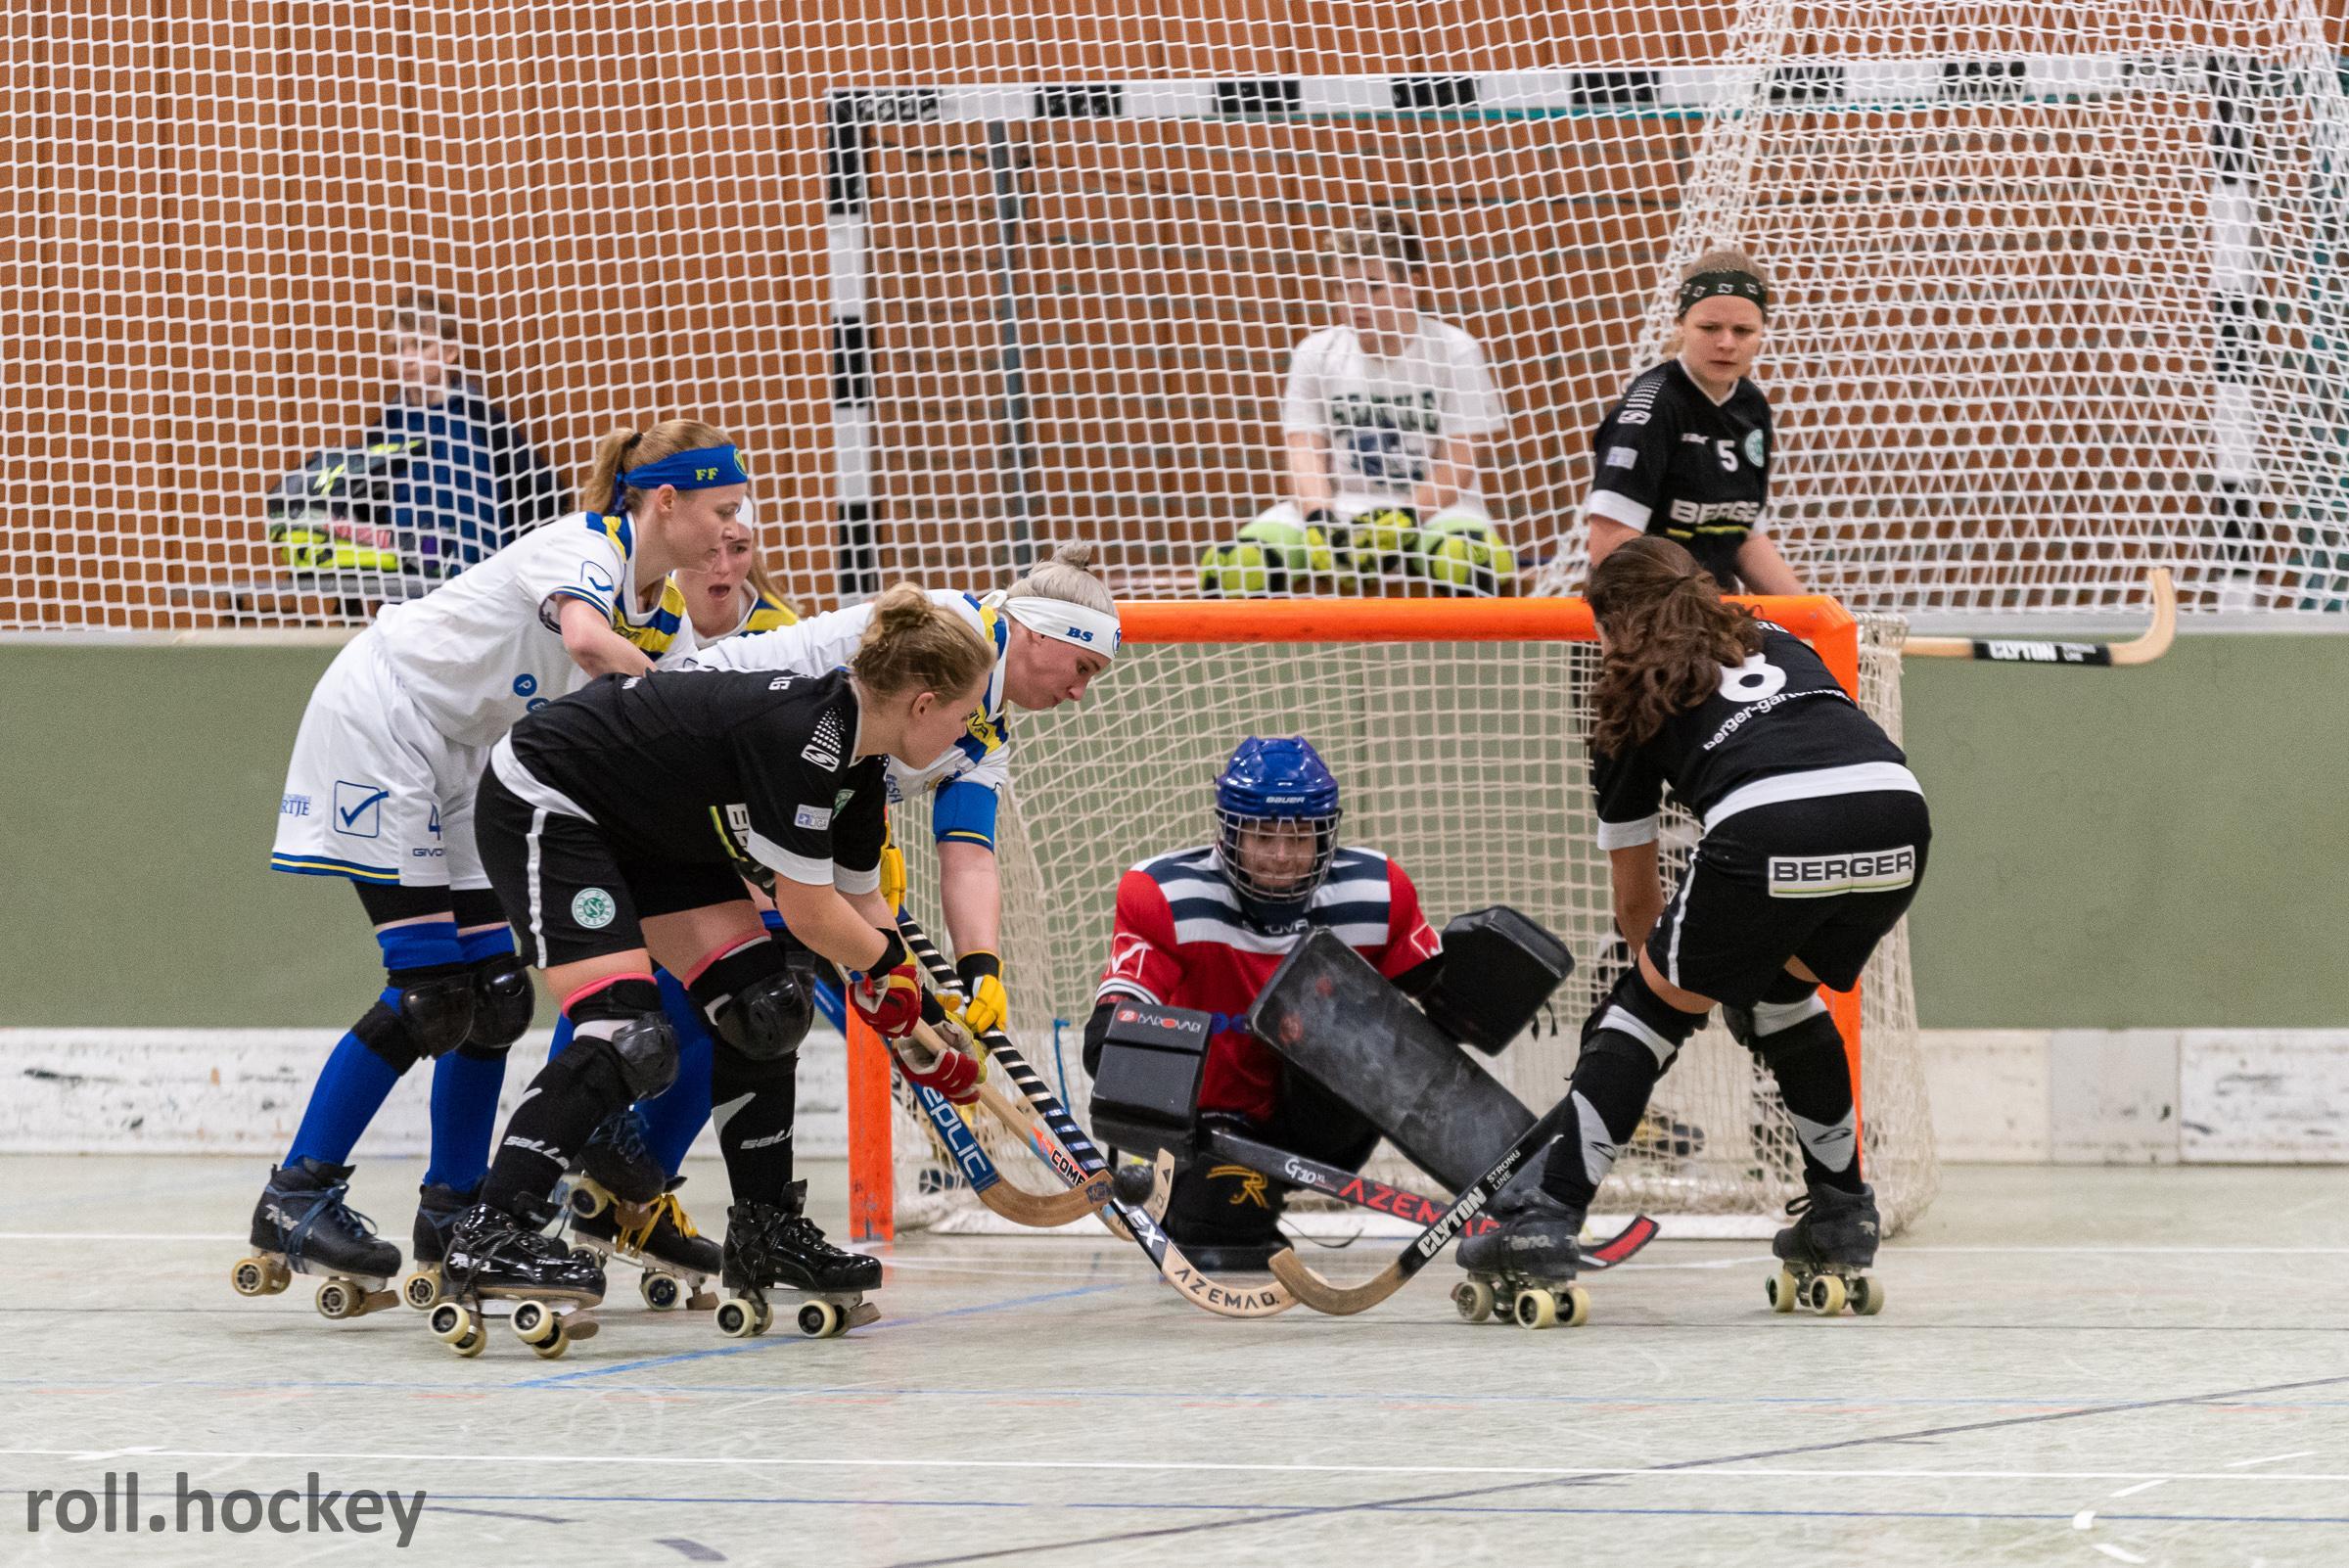 RSC Cronenberg Rollhockey Bundesliga Damen Spieltag 02.11.2019